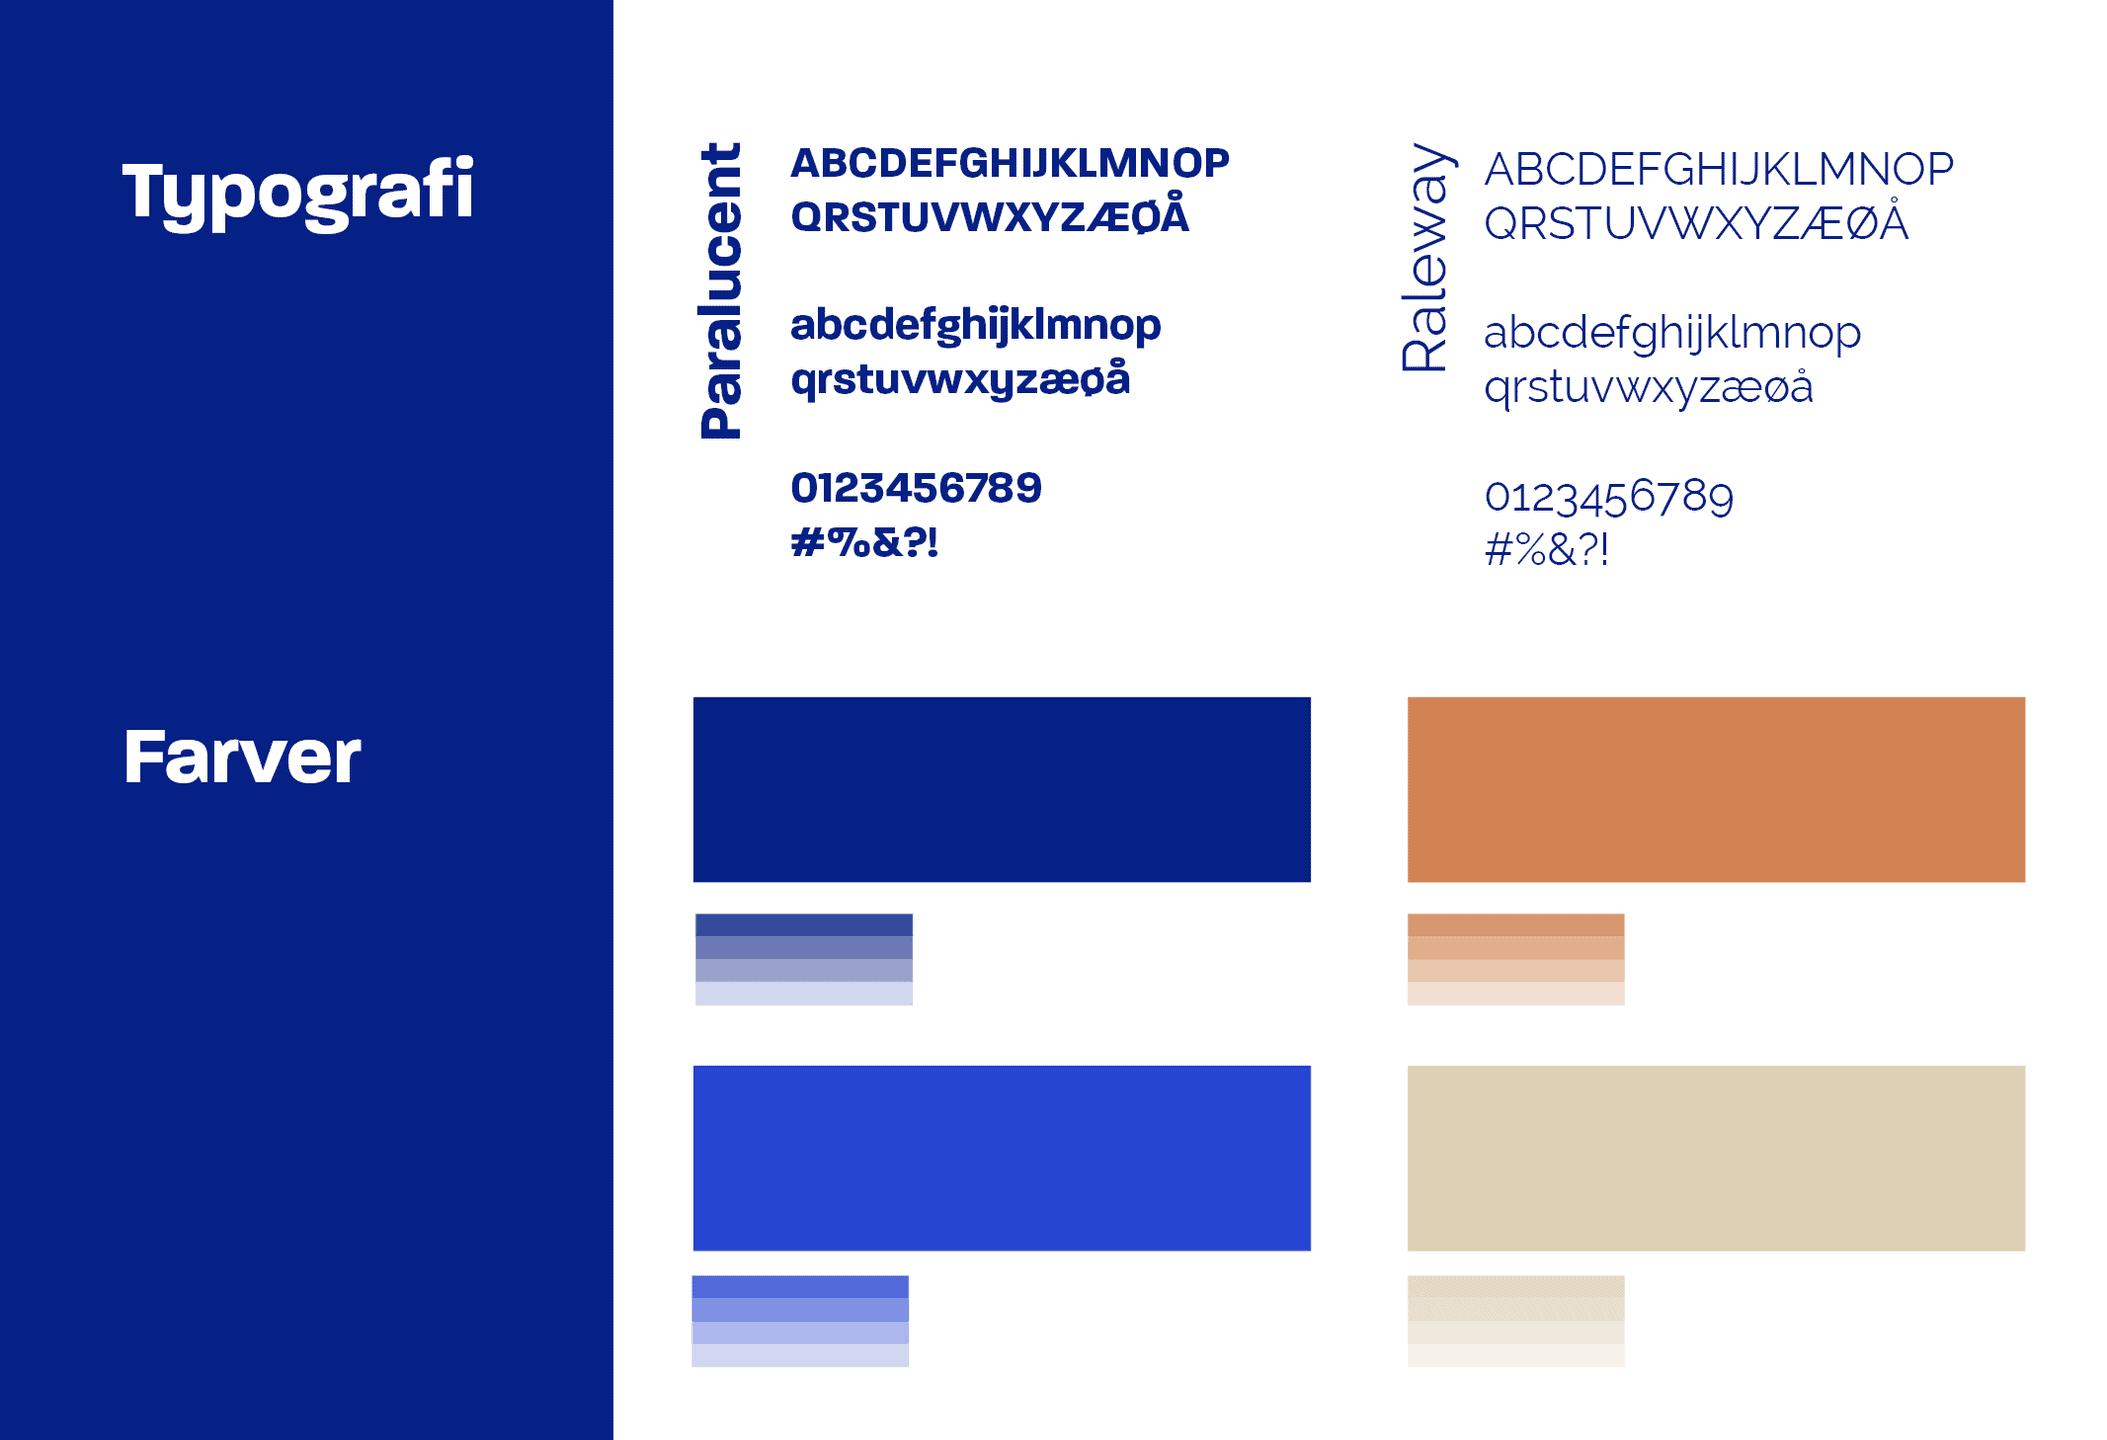 2021.08.21 ID KomgebroHuset grafik #1